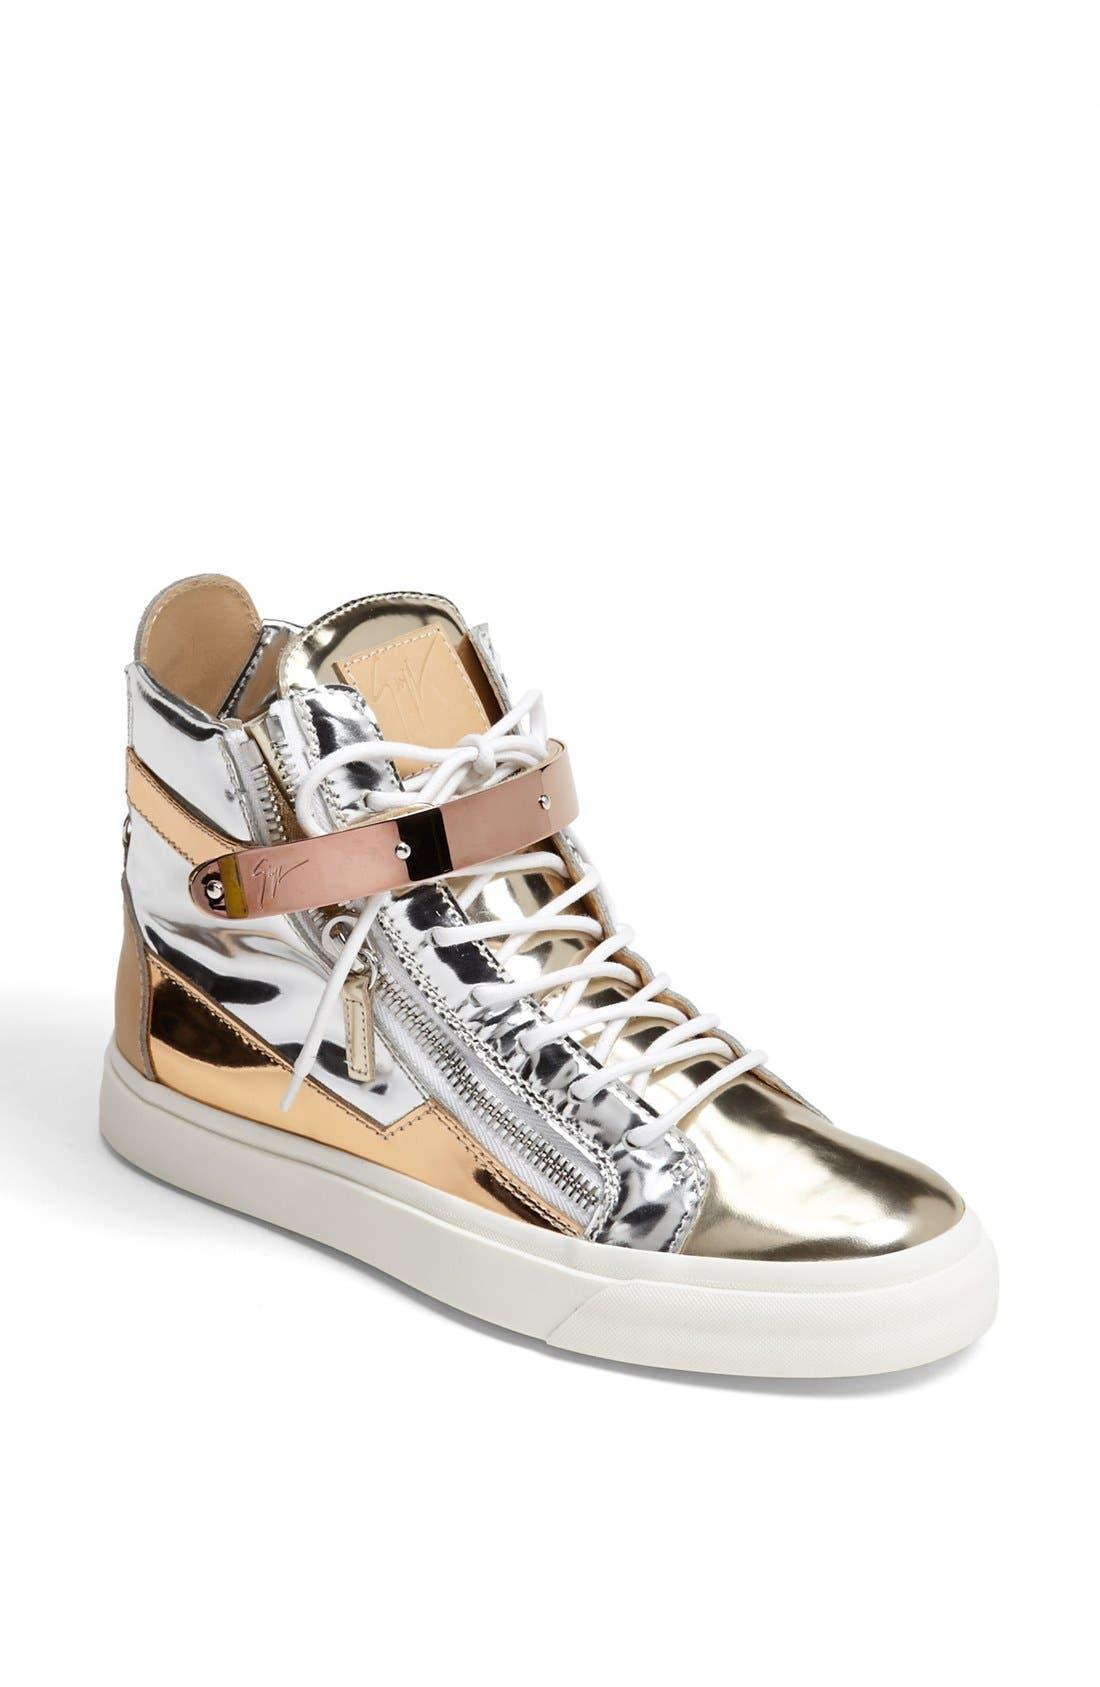 Main Image - Giuseppe Zanotti 'London' High Top Wedge Sneaker